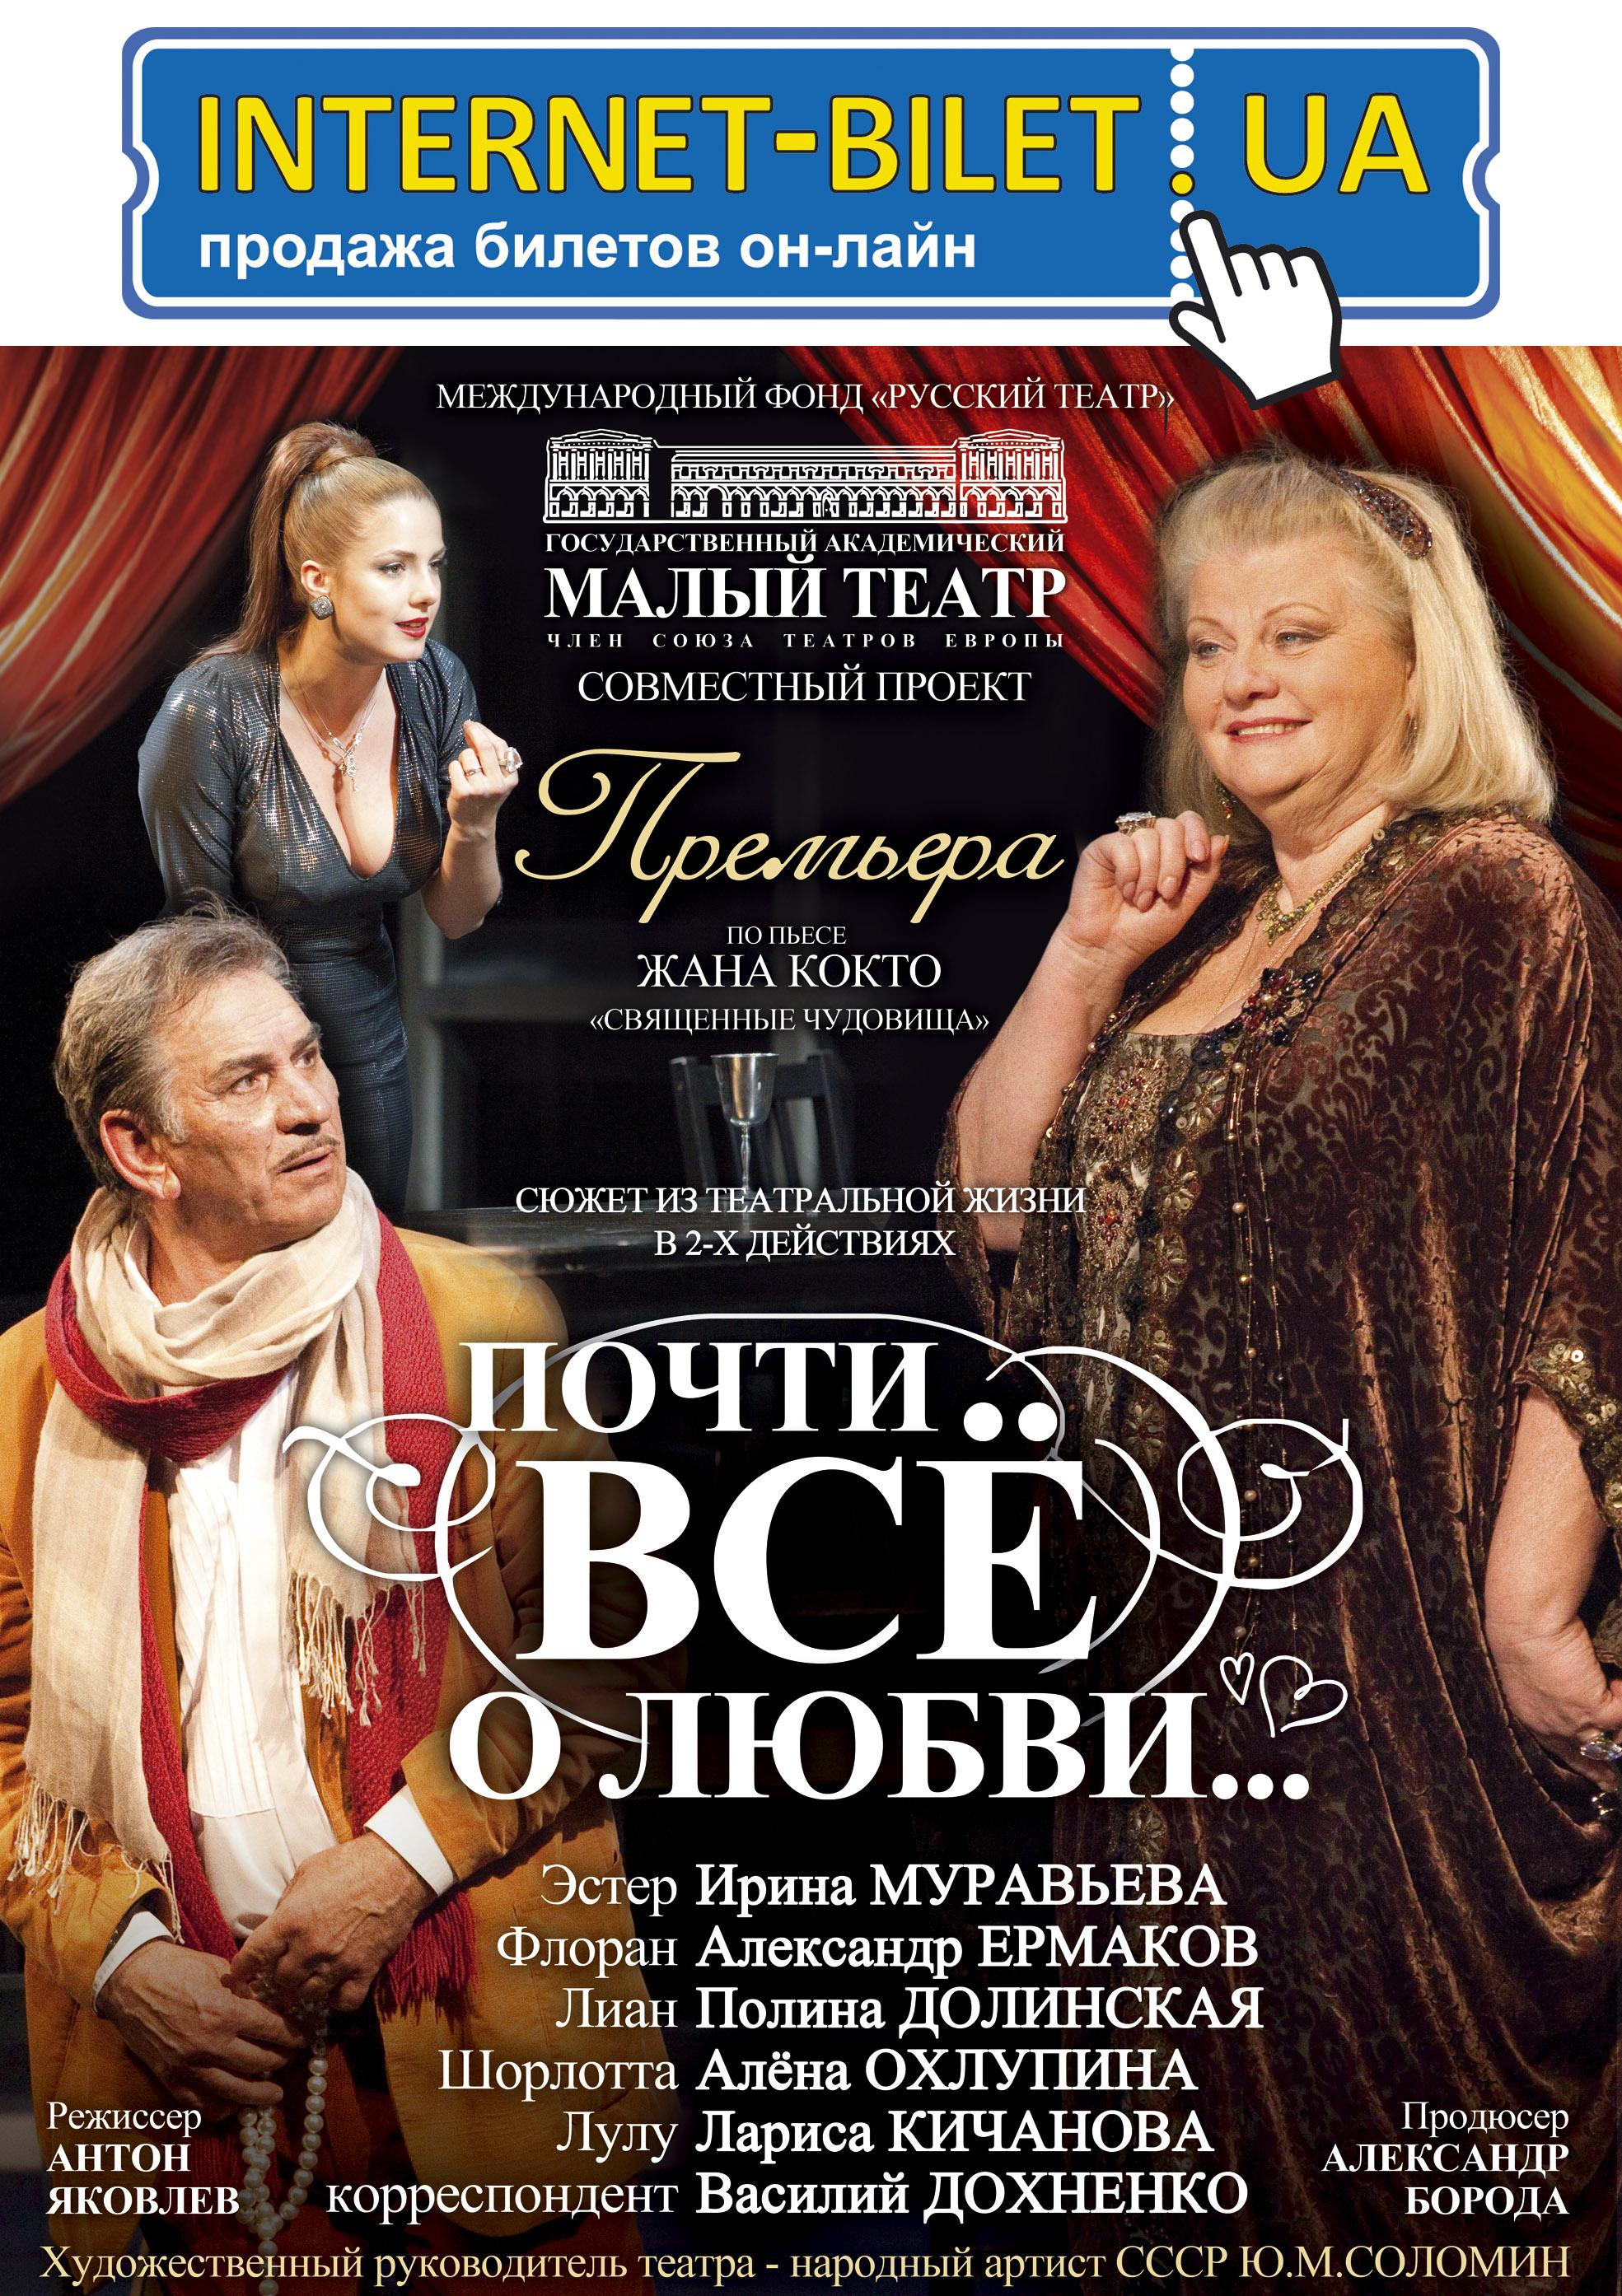 Продажа билетов театр одесса зимний театр сочи афиша на июнь 2017